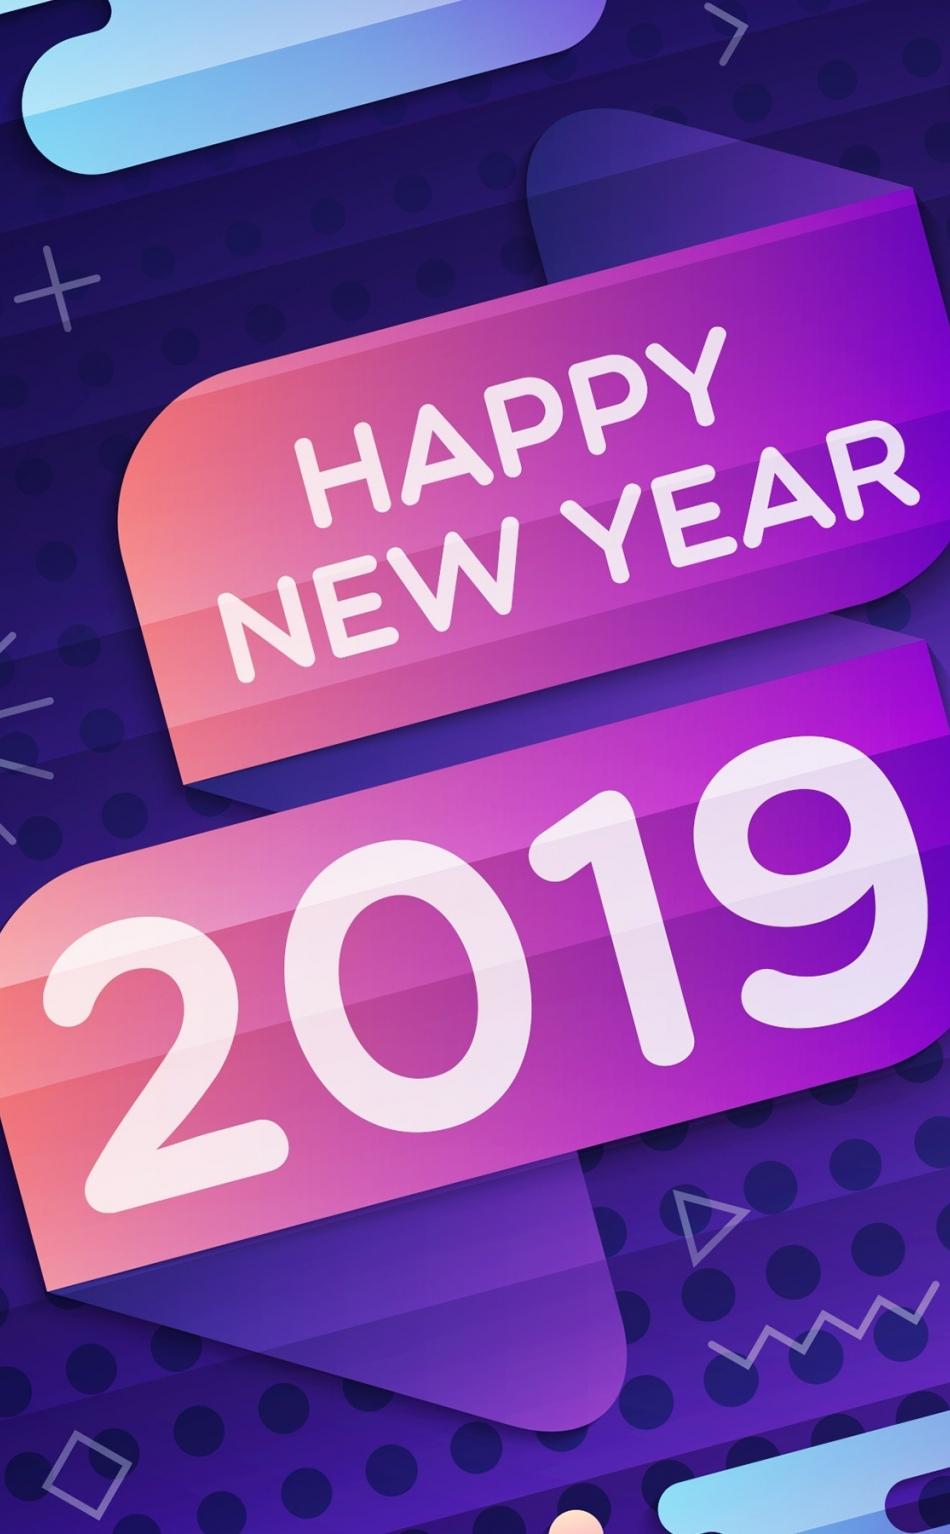 Download 950x1534 Wallpaper 2019 Happy New Year